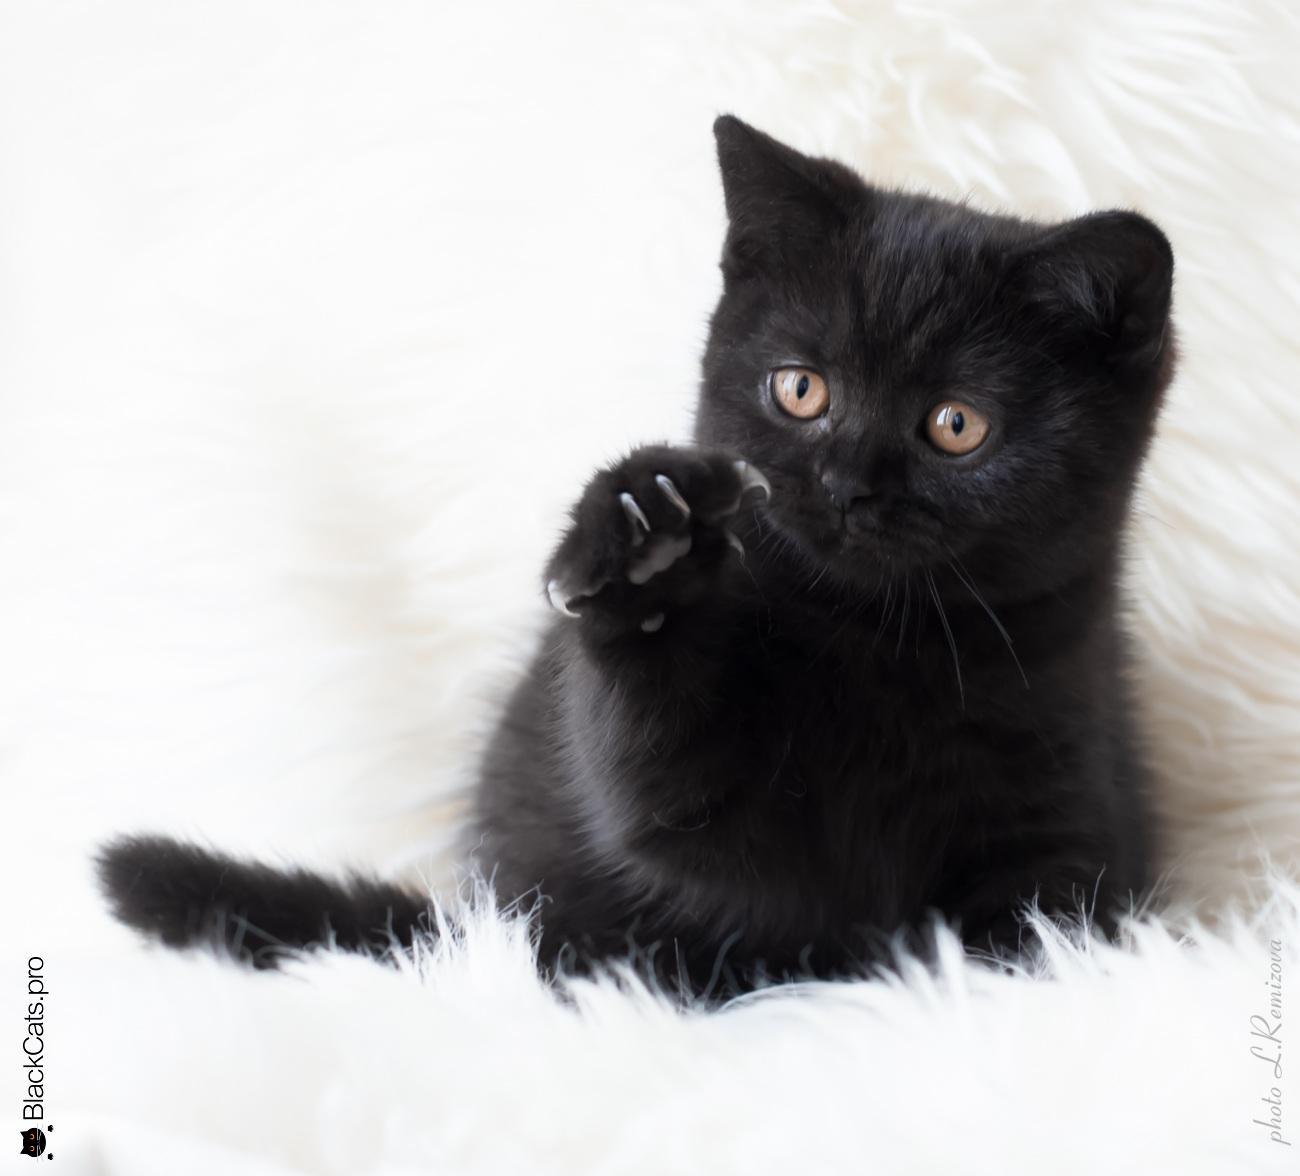 Empress Black Jetstone 3 months